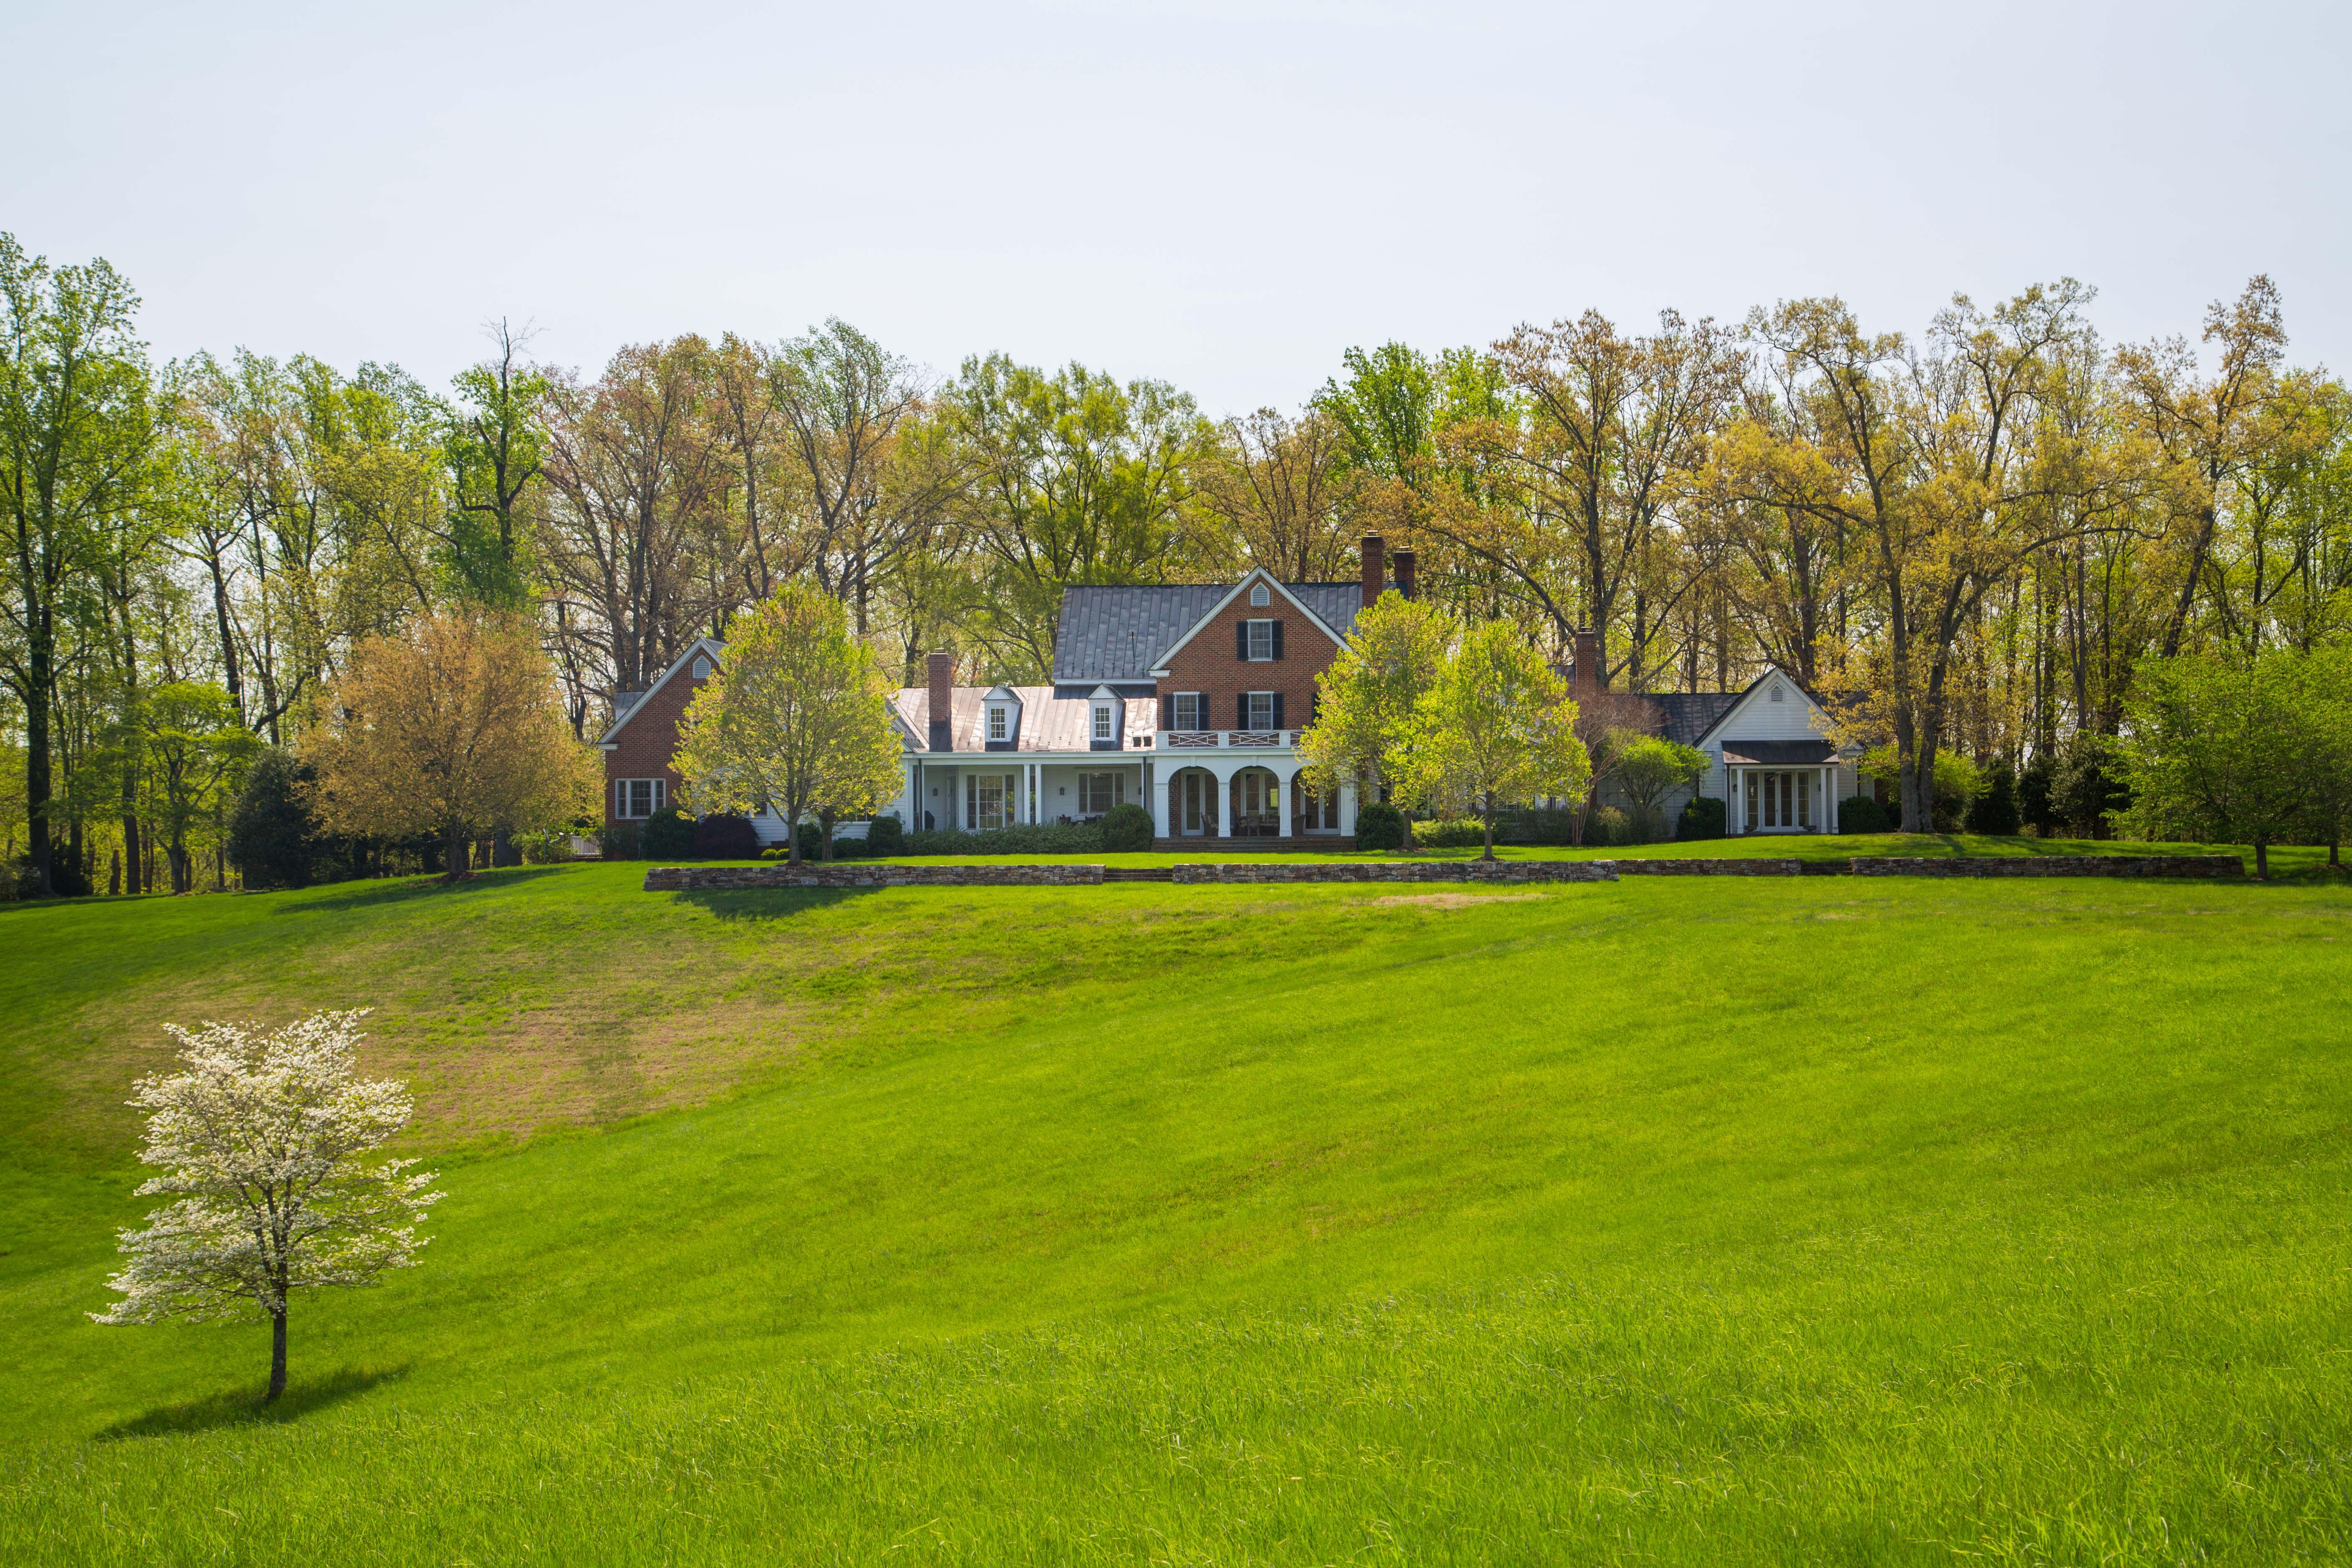 Single Family Home for Sale at QUAIL RIDGE 2575 RIDGE RD Charlottesville, Virginia 22901 United States